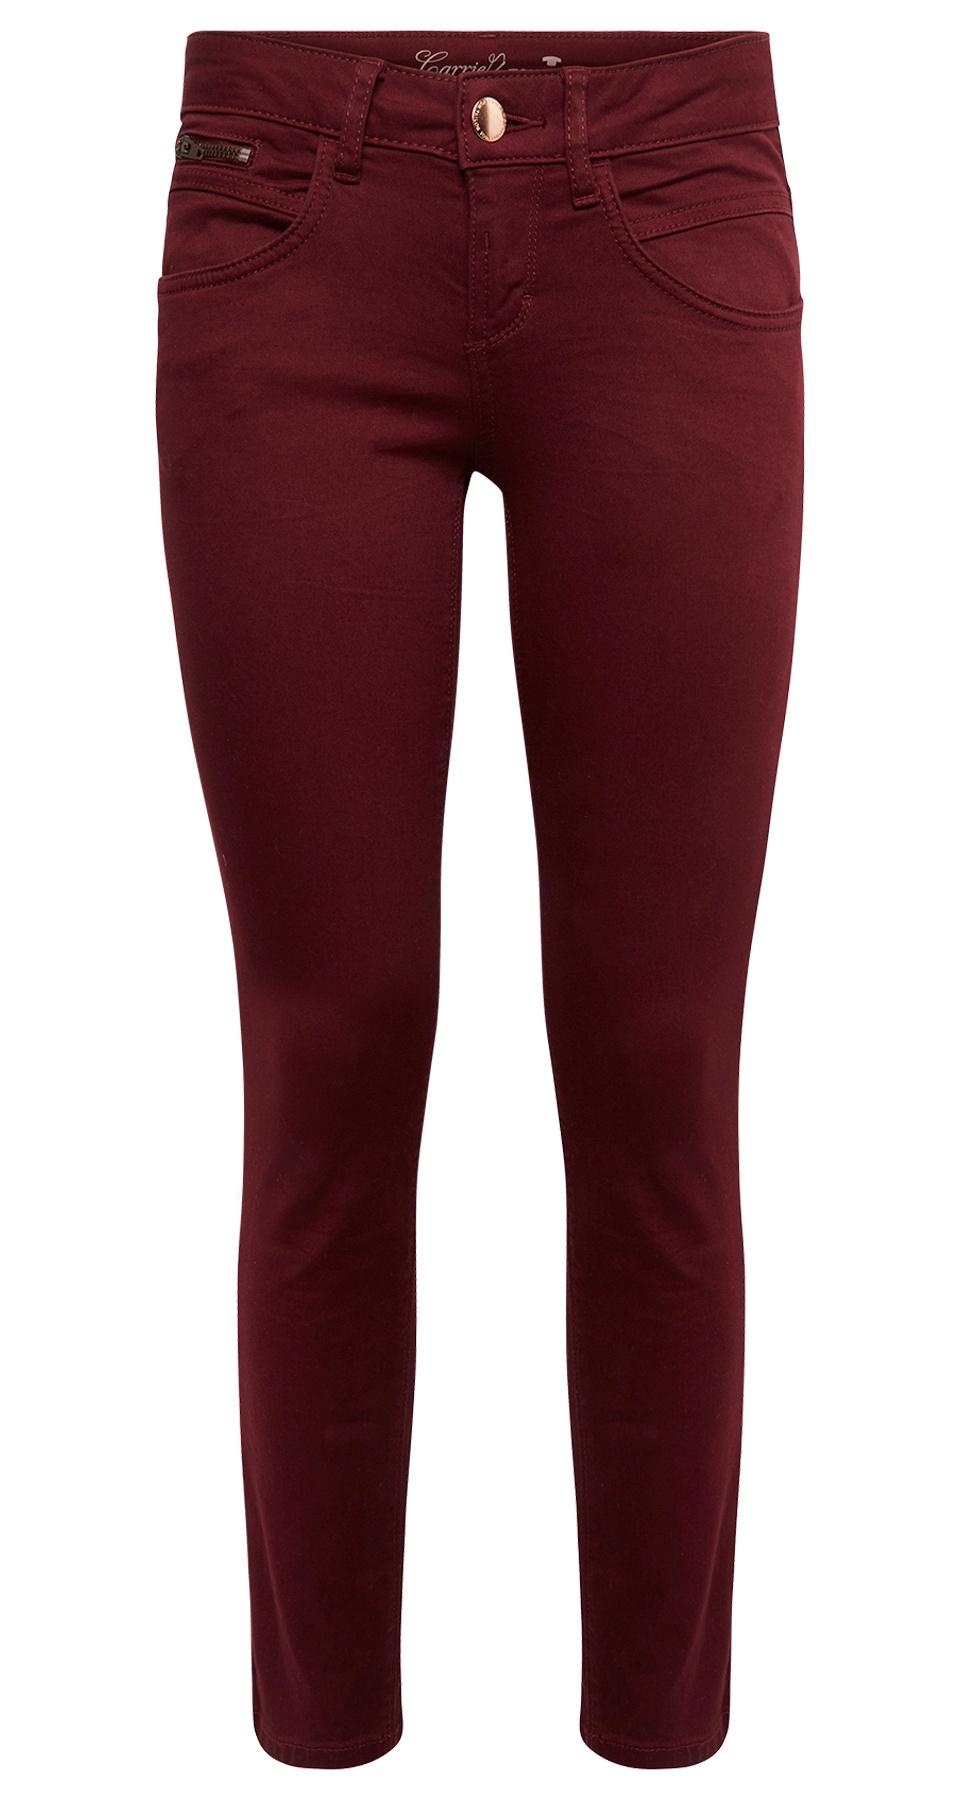 TTW_707_jeans-bordo_62058630070_59,99eur